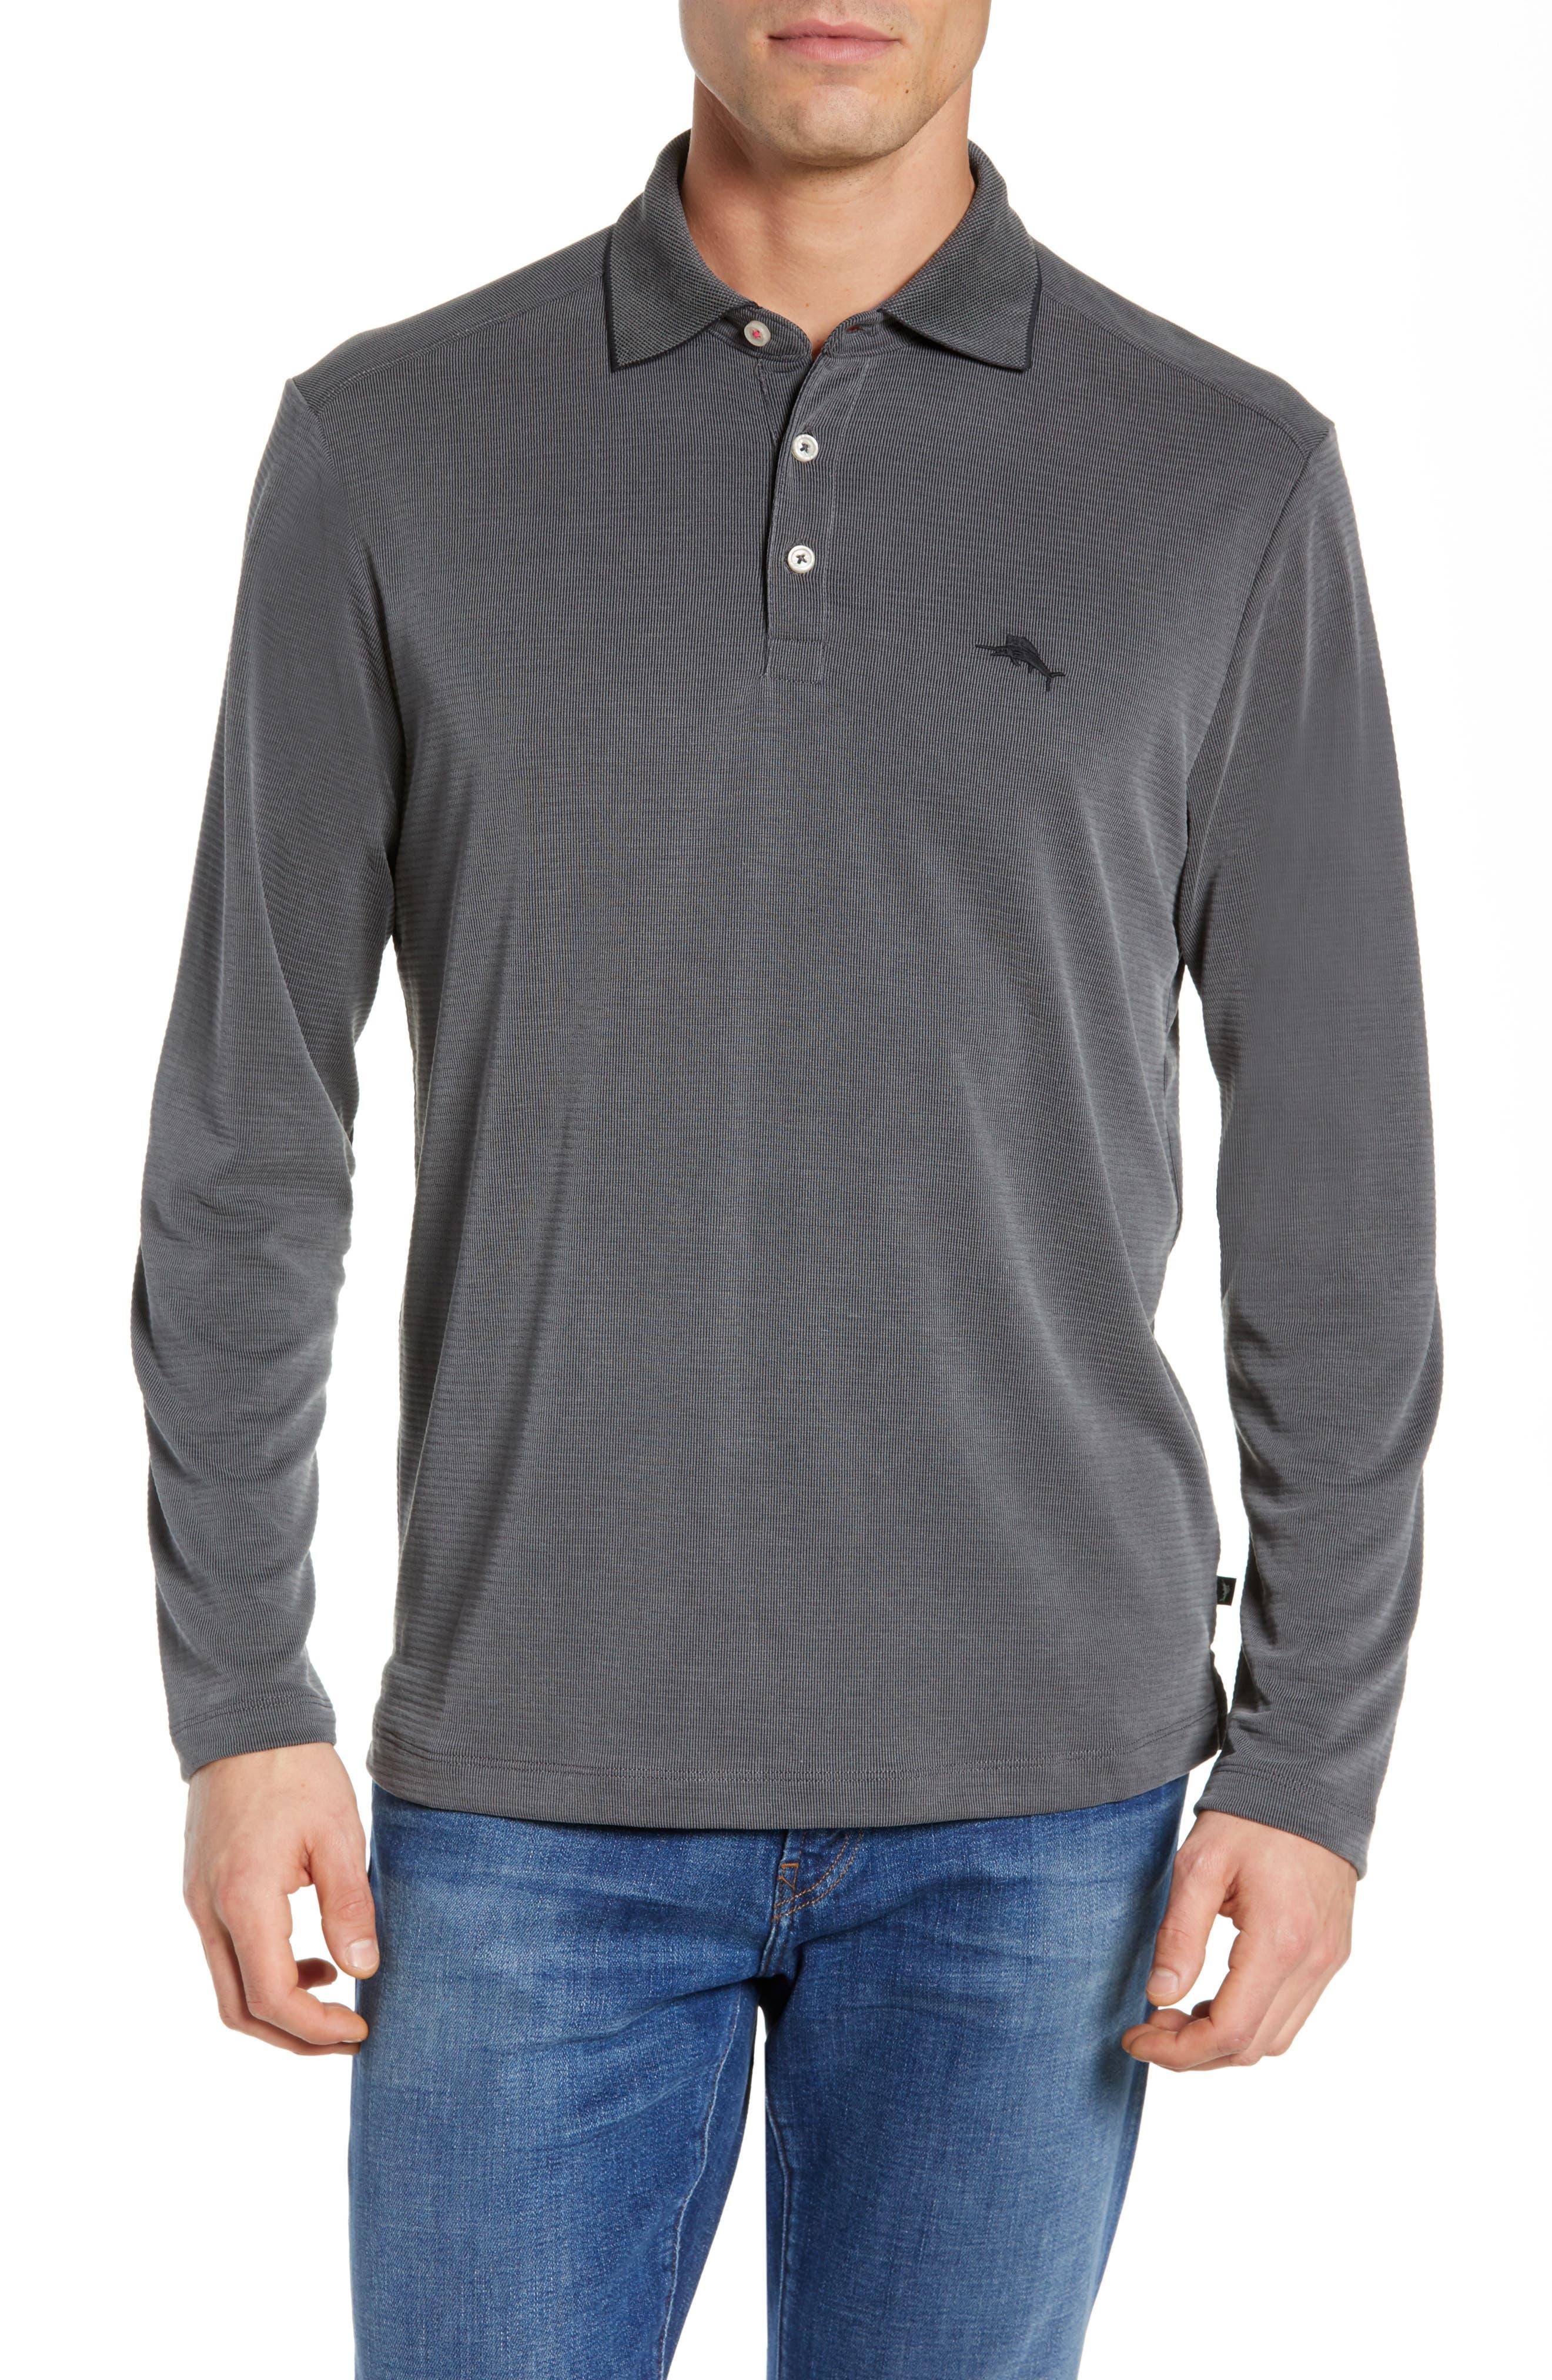 Coastal Crest Regular Fit Polo,                             Main thumbnail 1, color,                             BLACK